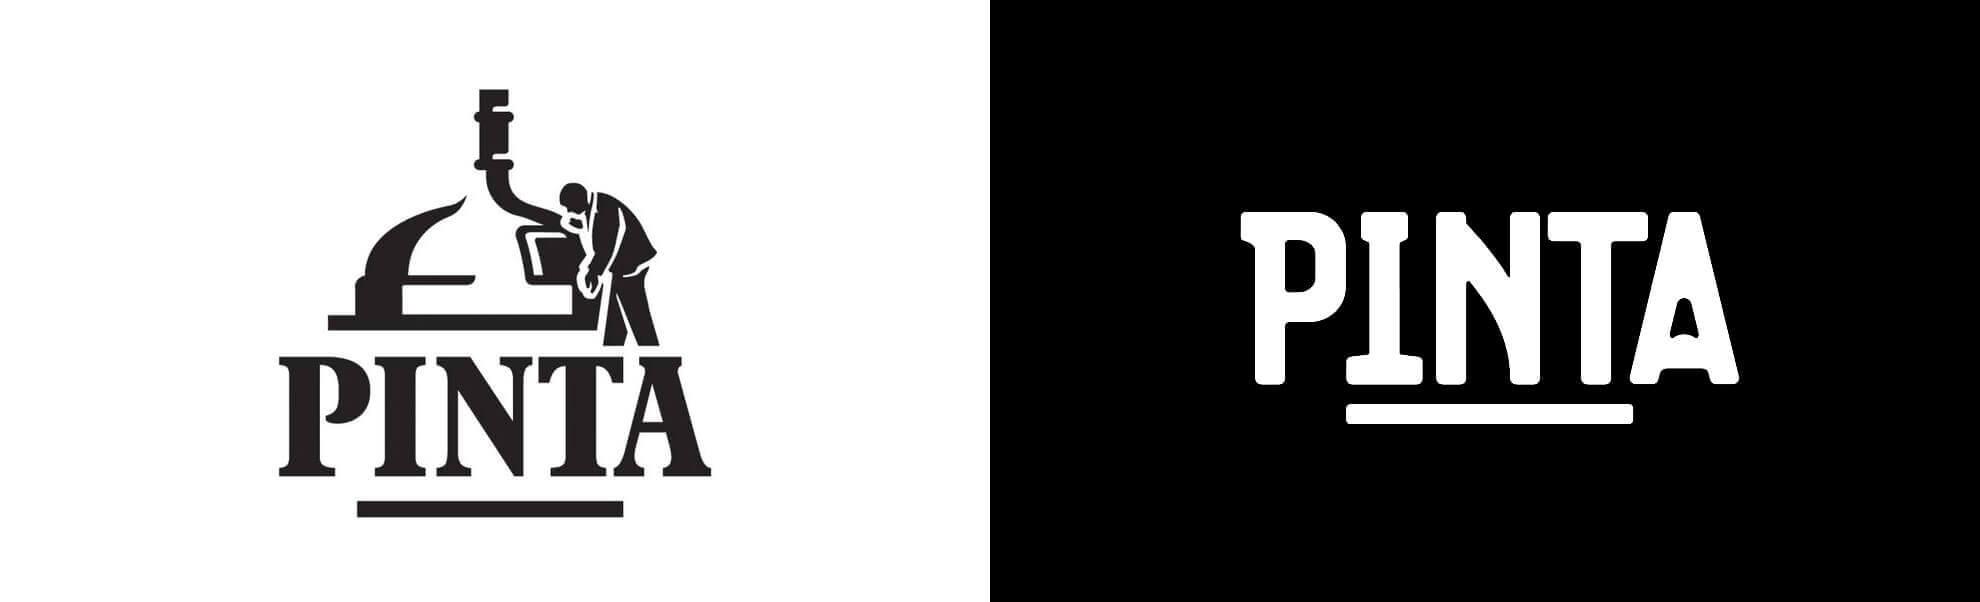 Stare inowe logo browaru Pinta